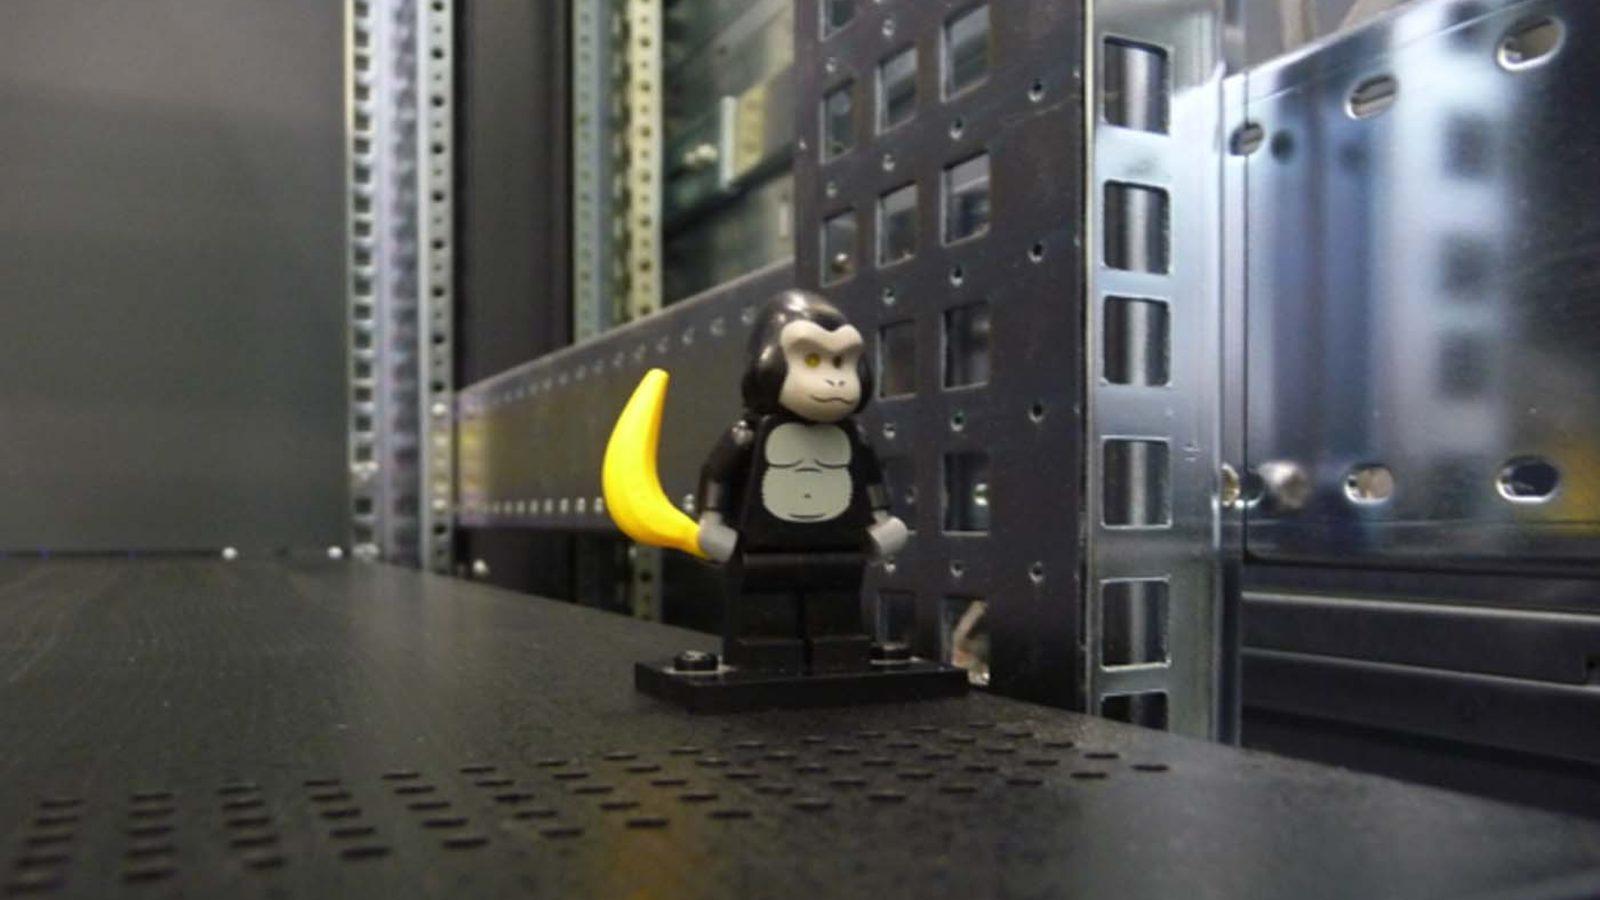 Photo of LEGO gorilla